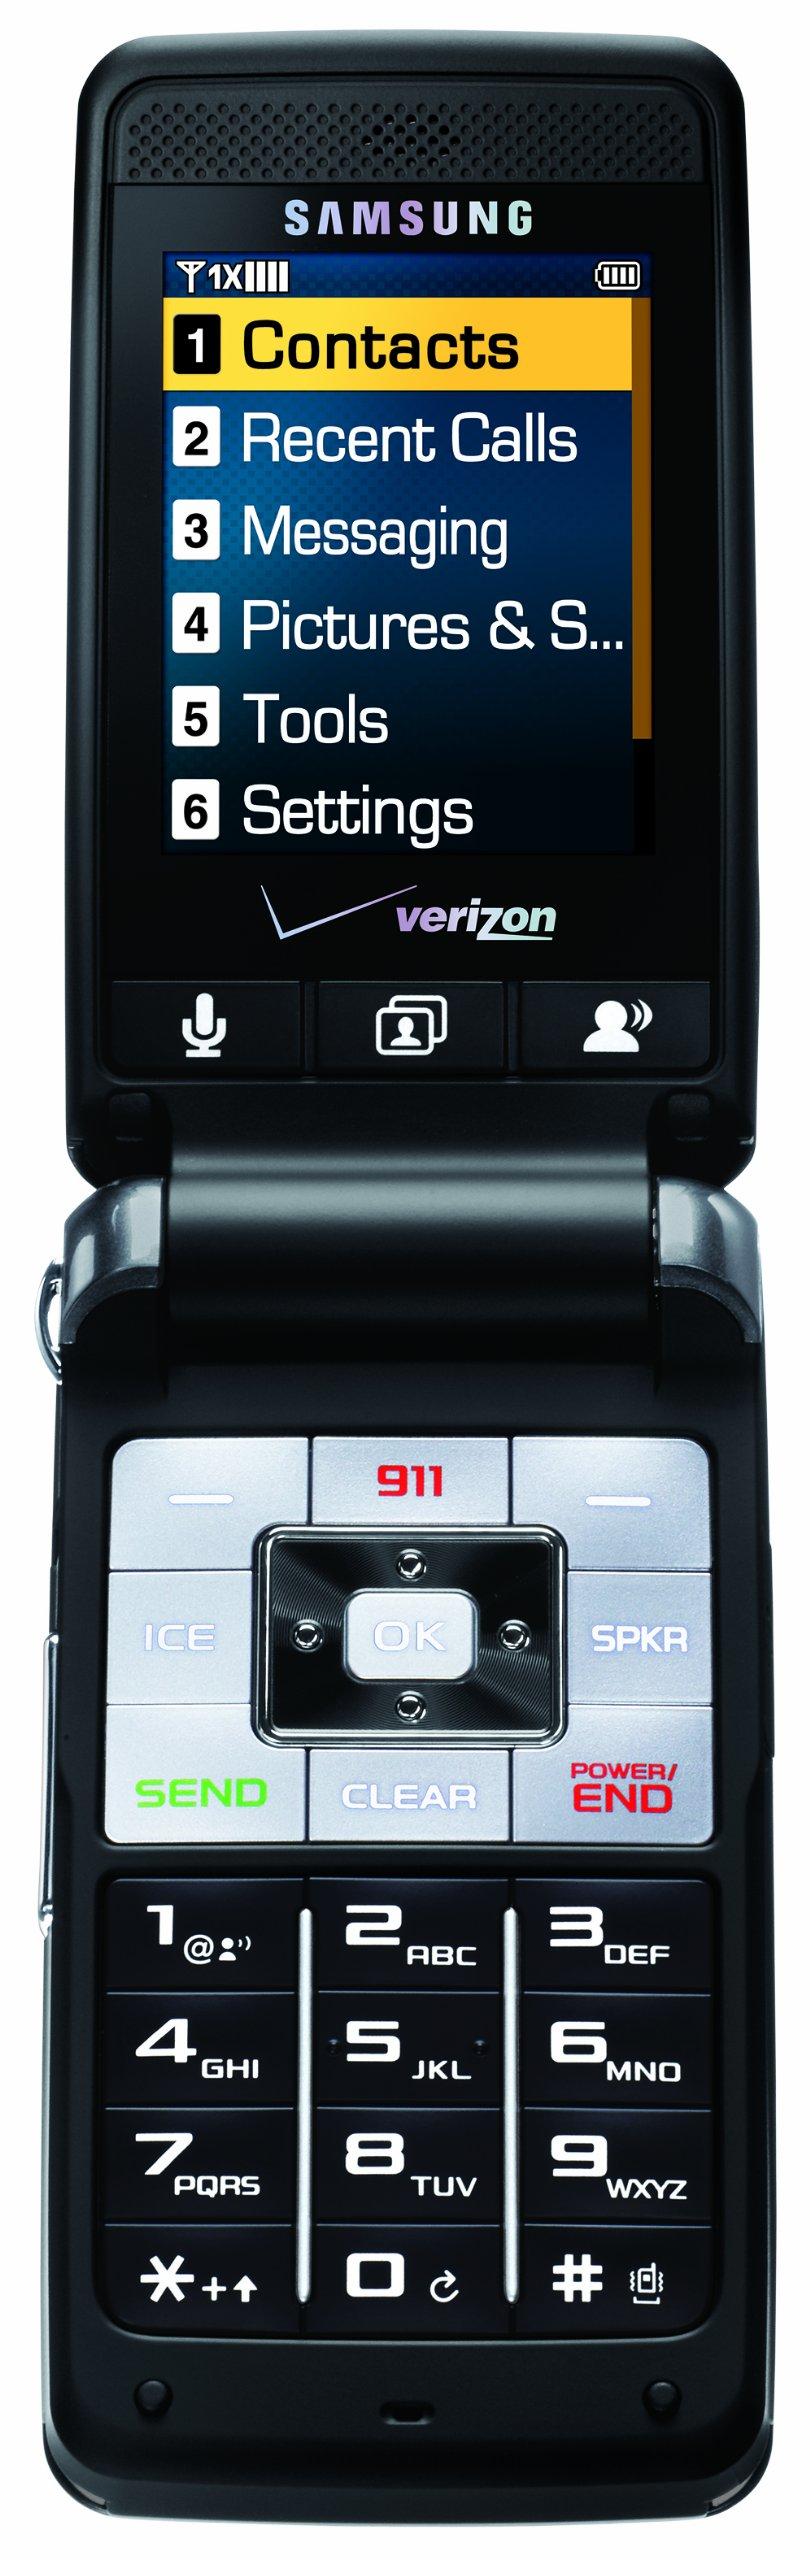 Samsung Haven U320 Phone (Verizon Wireless) by Samsung (Image #6)